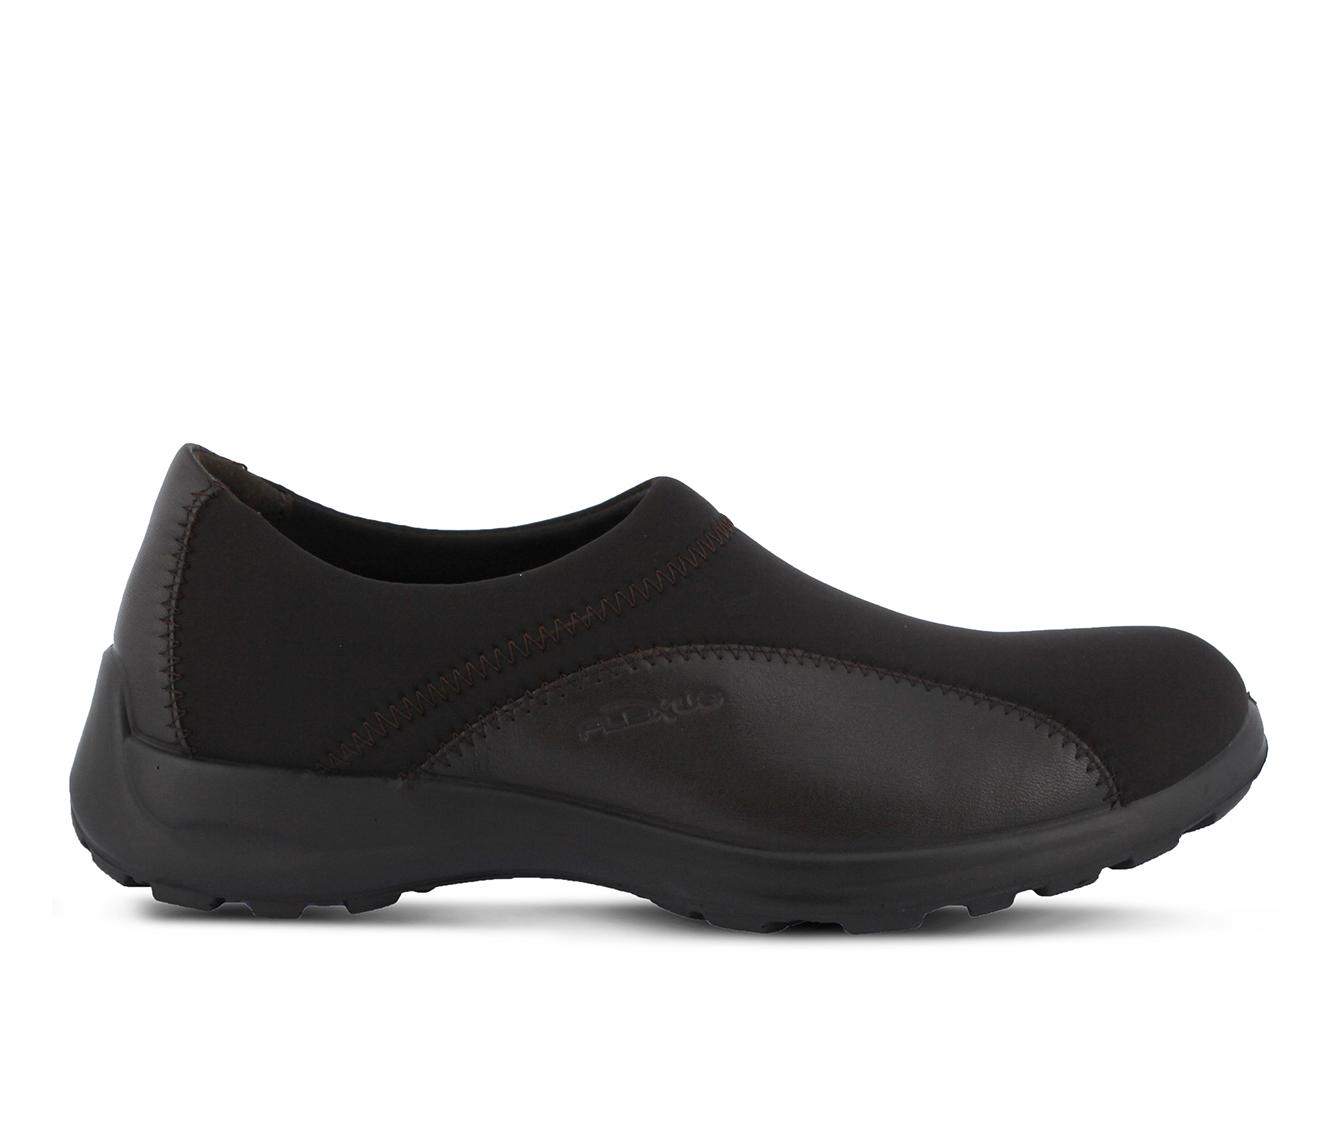 Flexus Willow Women's Shoe (Black Leather)